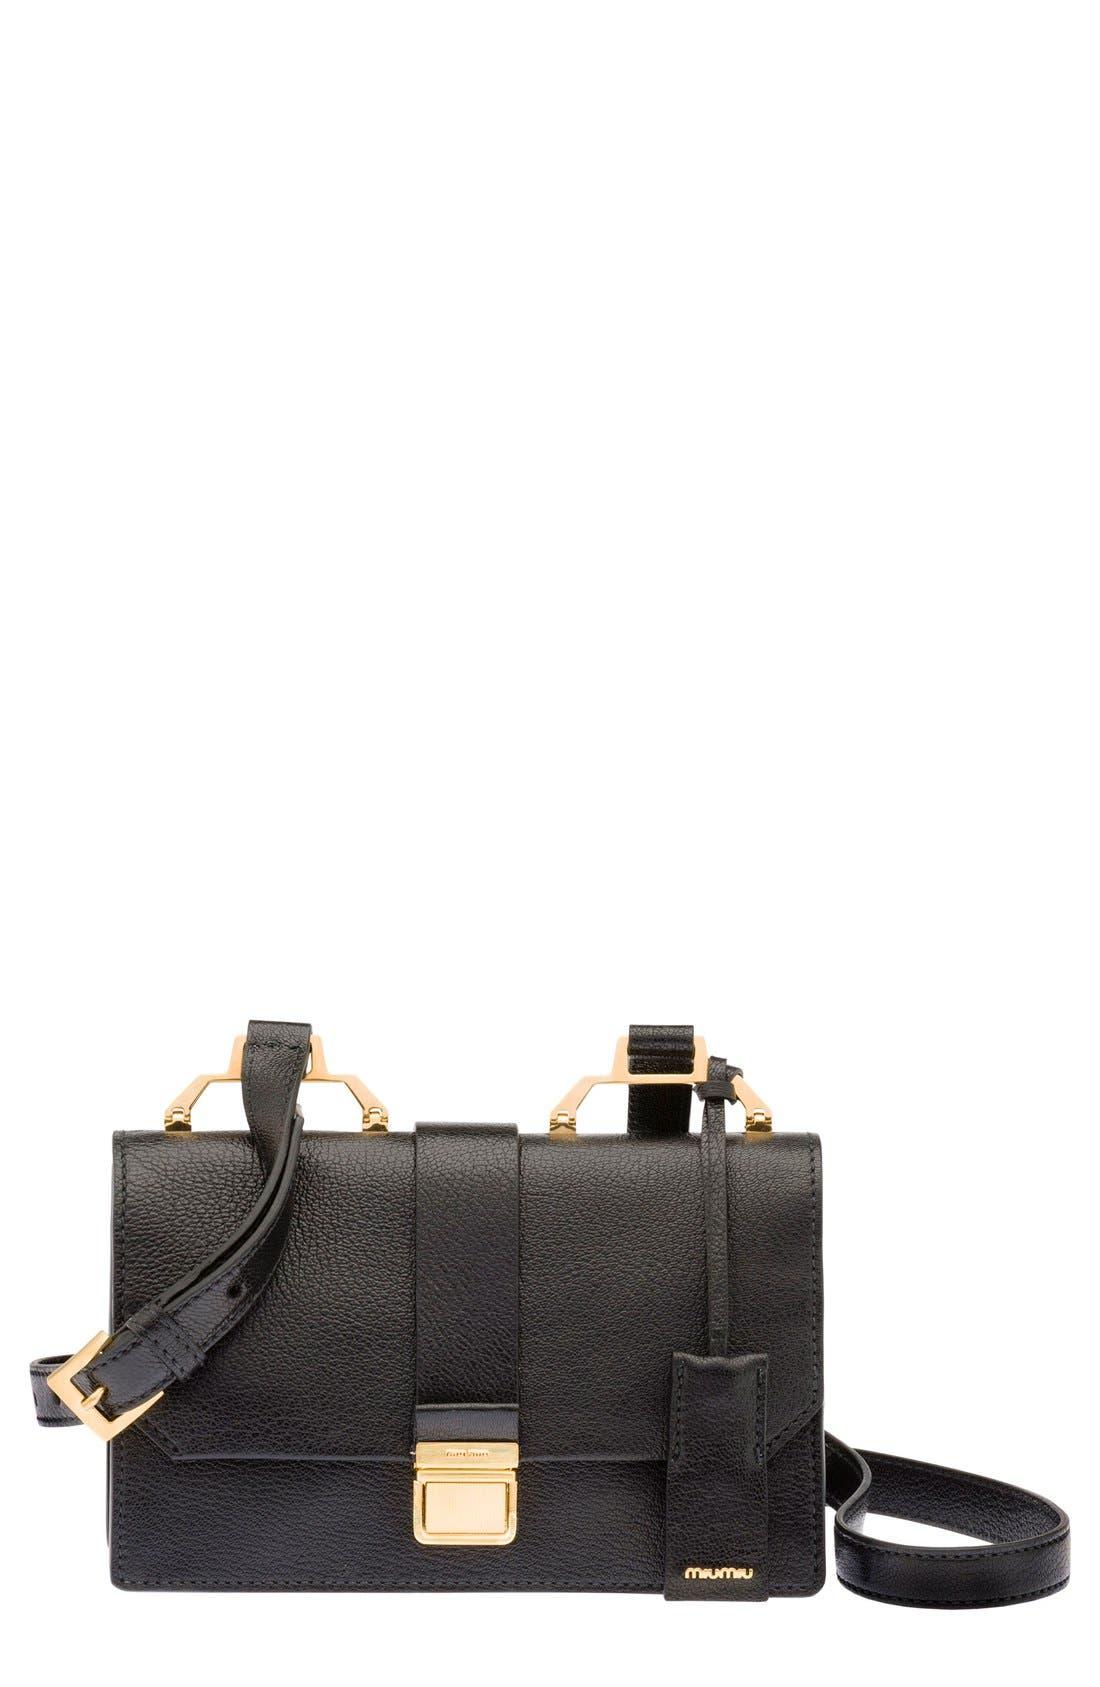 Miu Miu 'Small Madras' Goatskin Leather Shoulder Bag